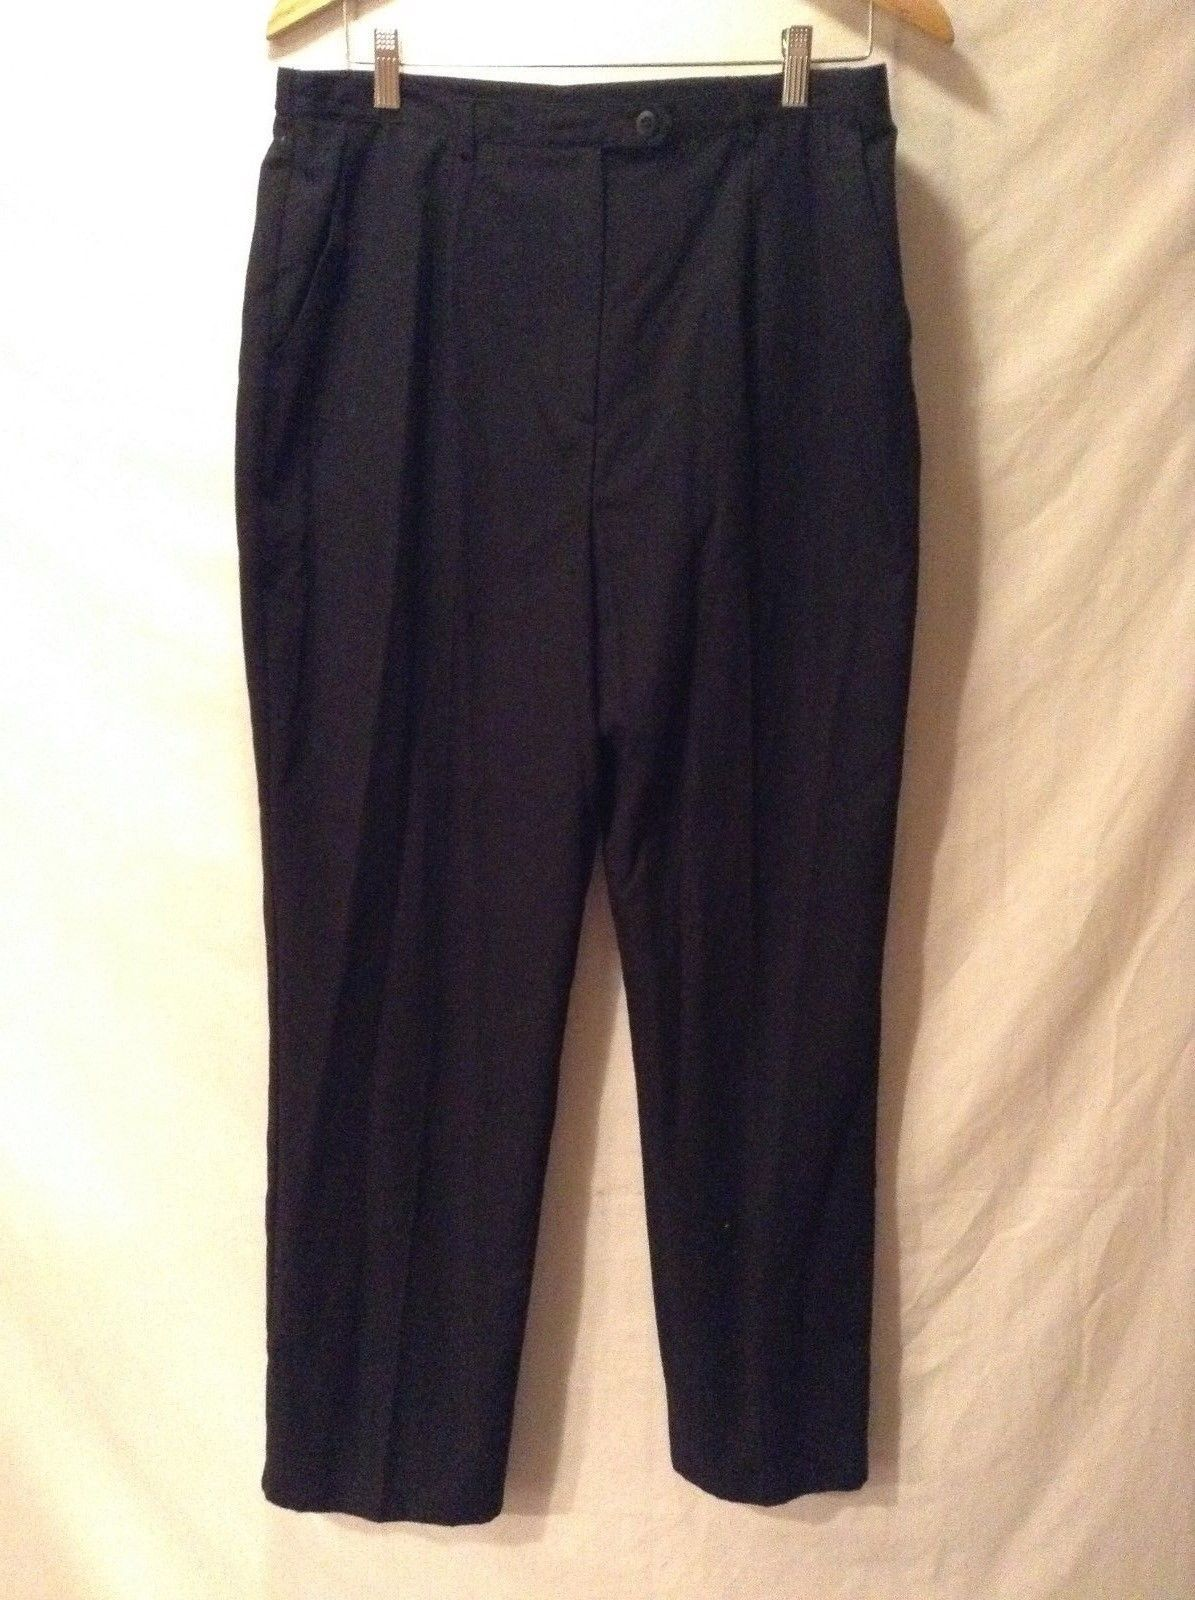 Ladies Sag Harbor Black Dress Pants Size 16